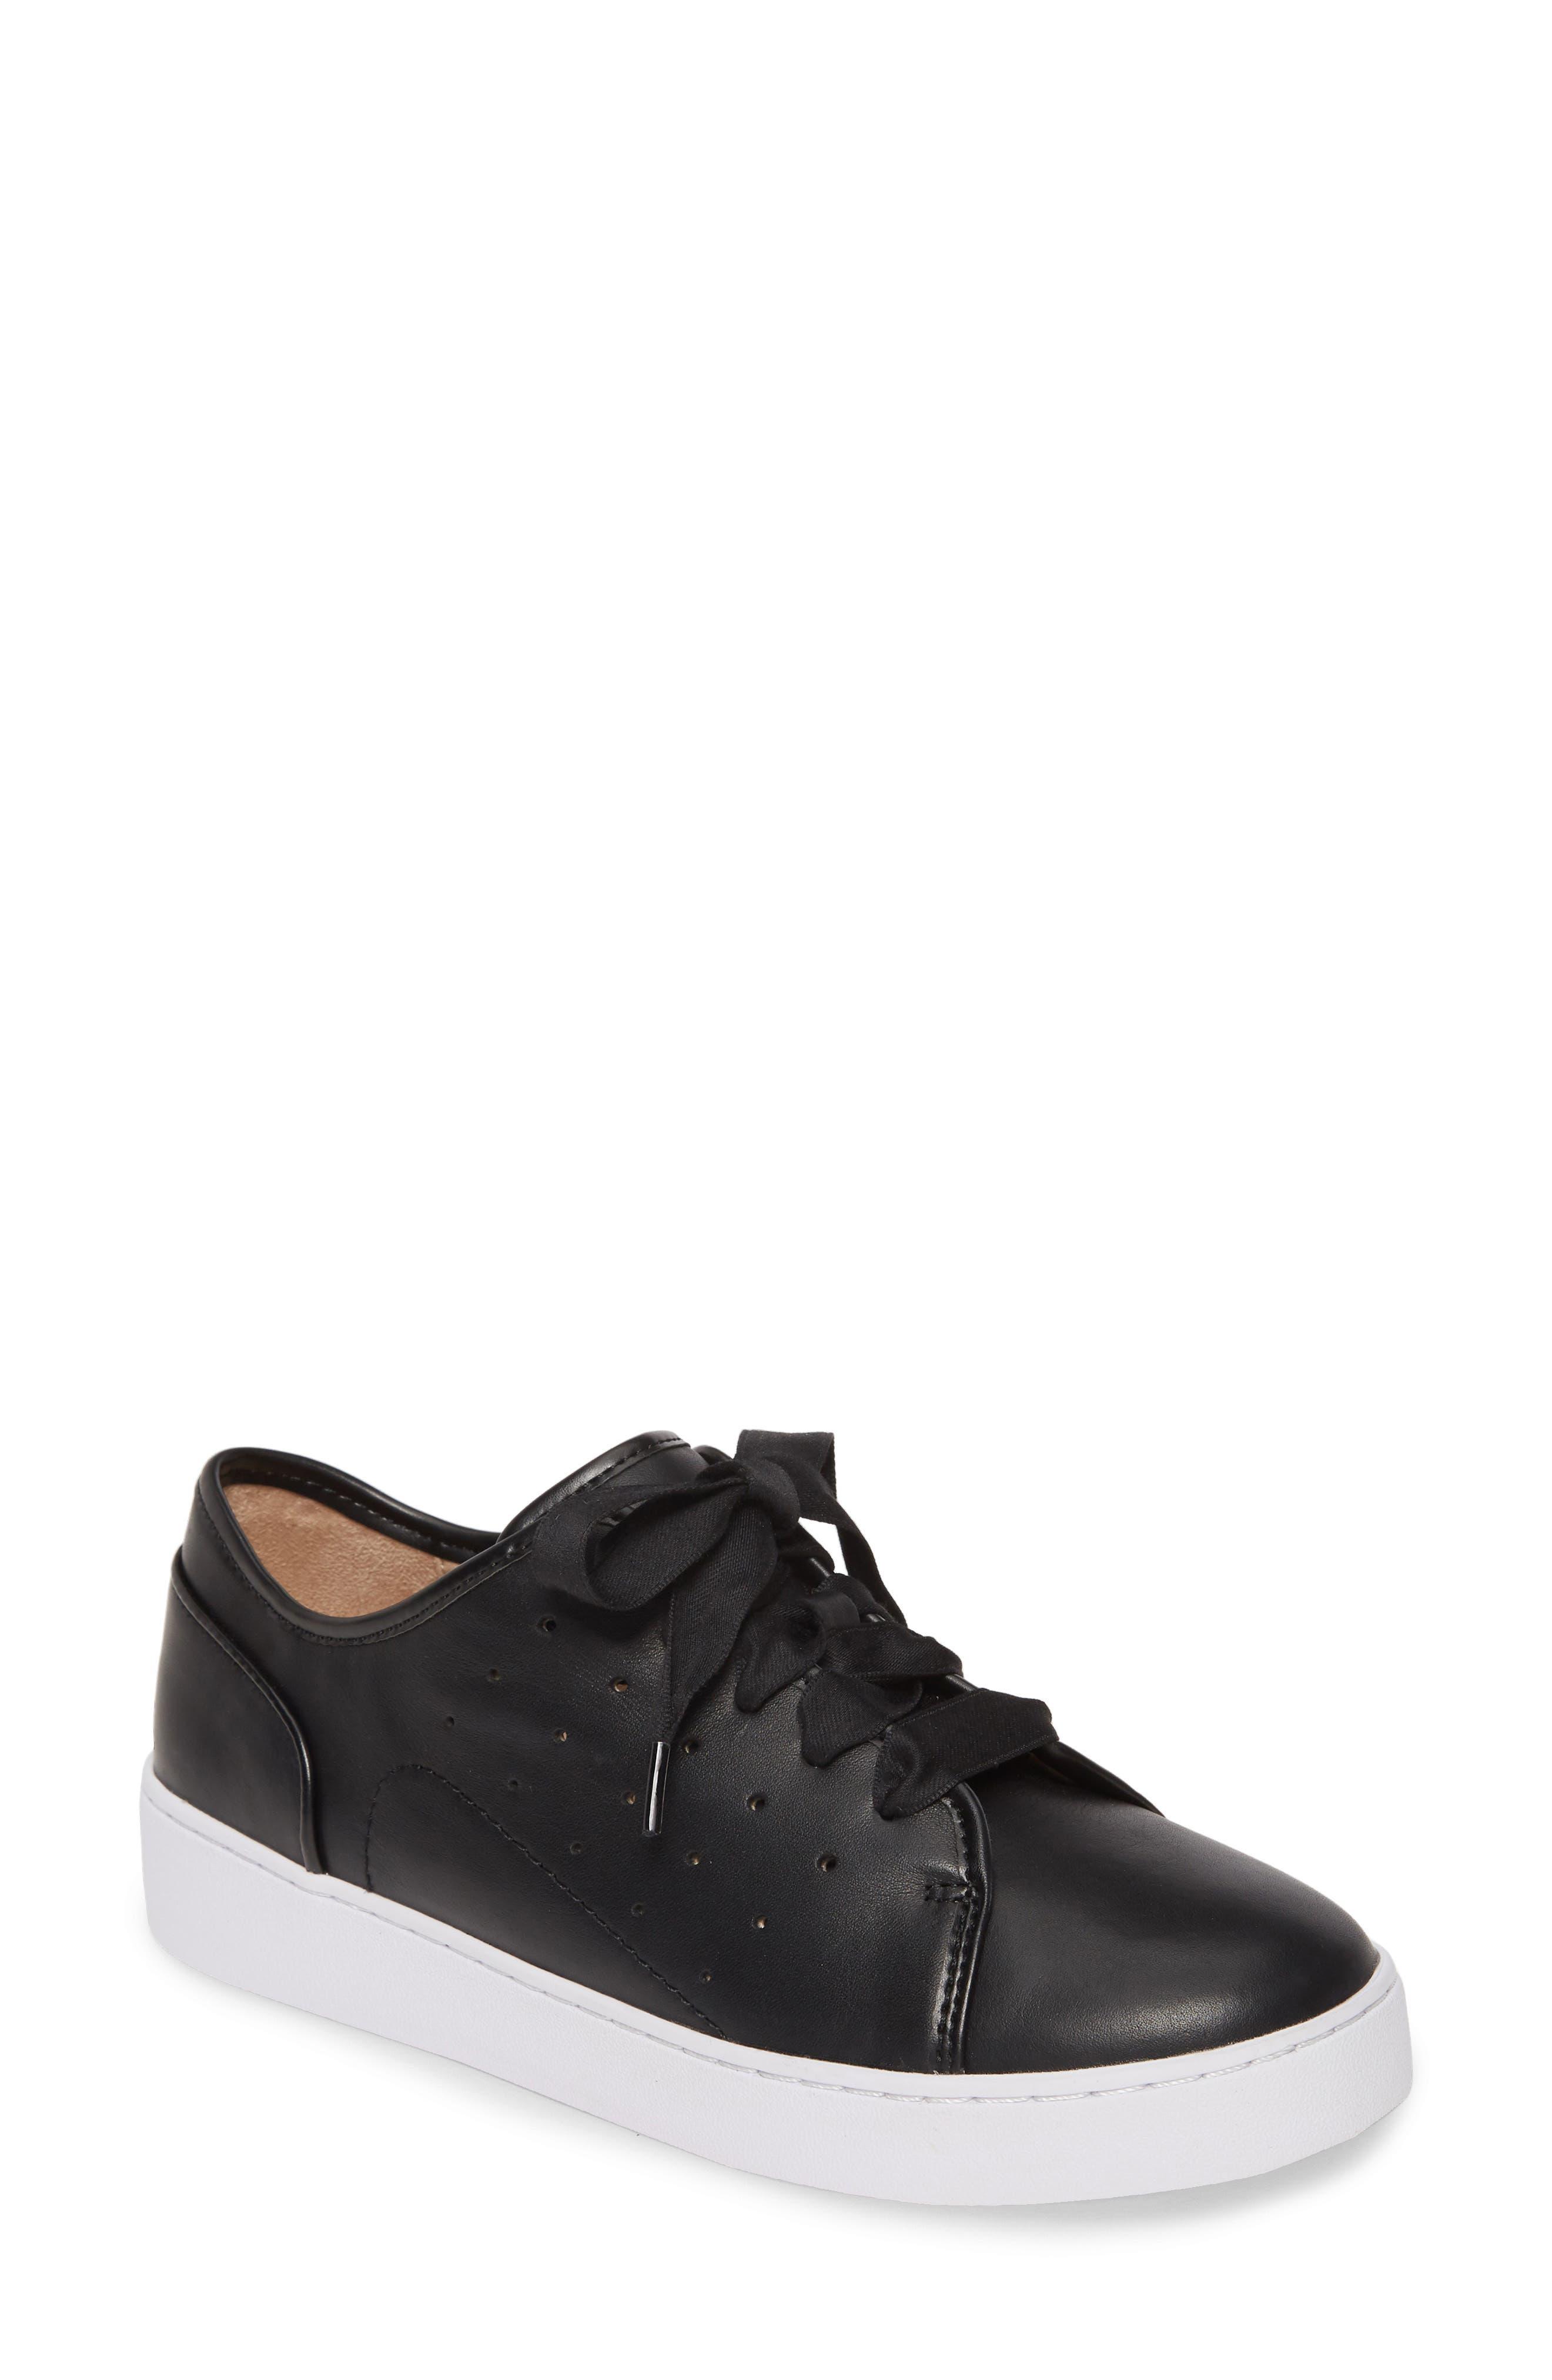 Vionic Keke Sneaker- Black